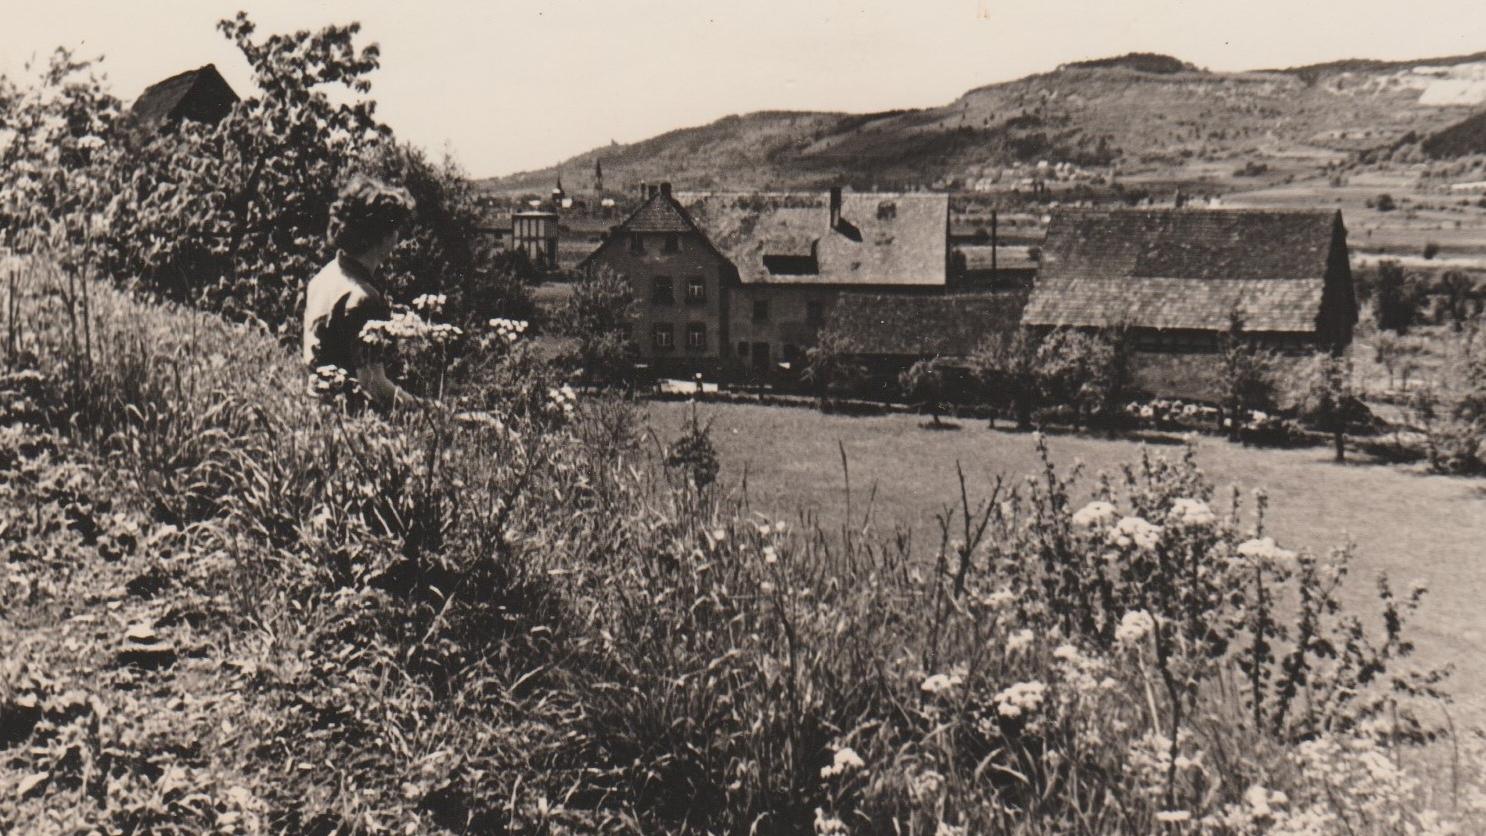 Der Landgasthof Bieger in Rothenbühl 1973.